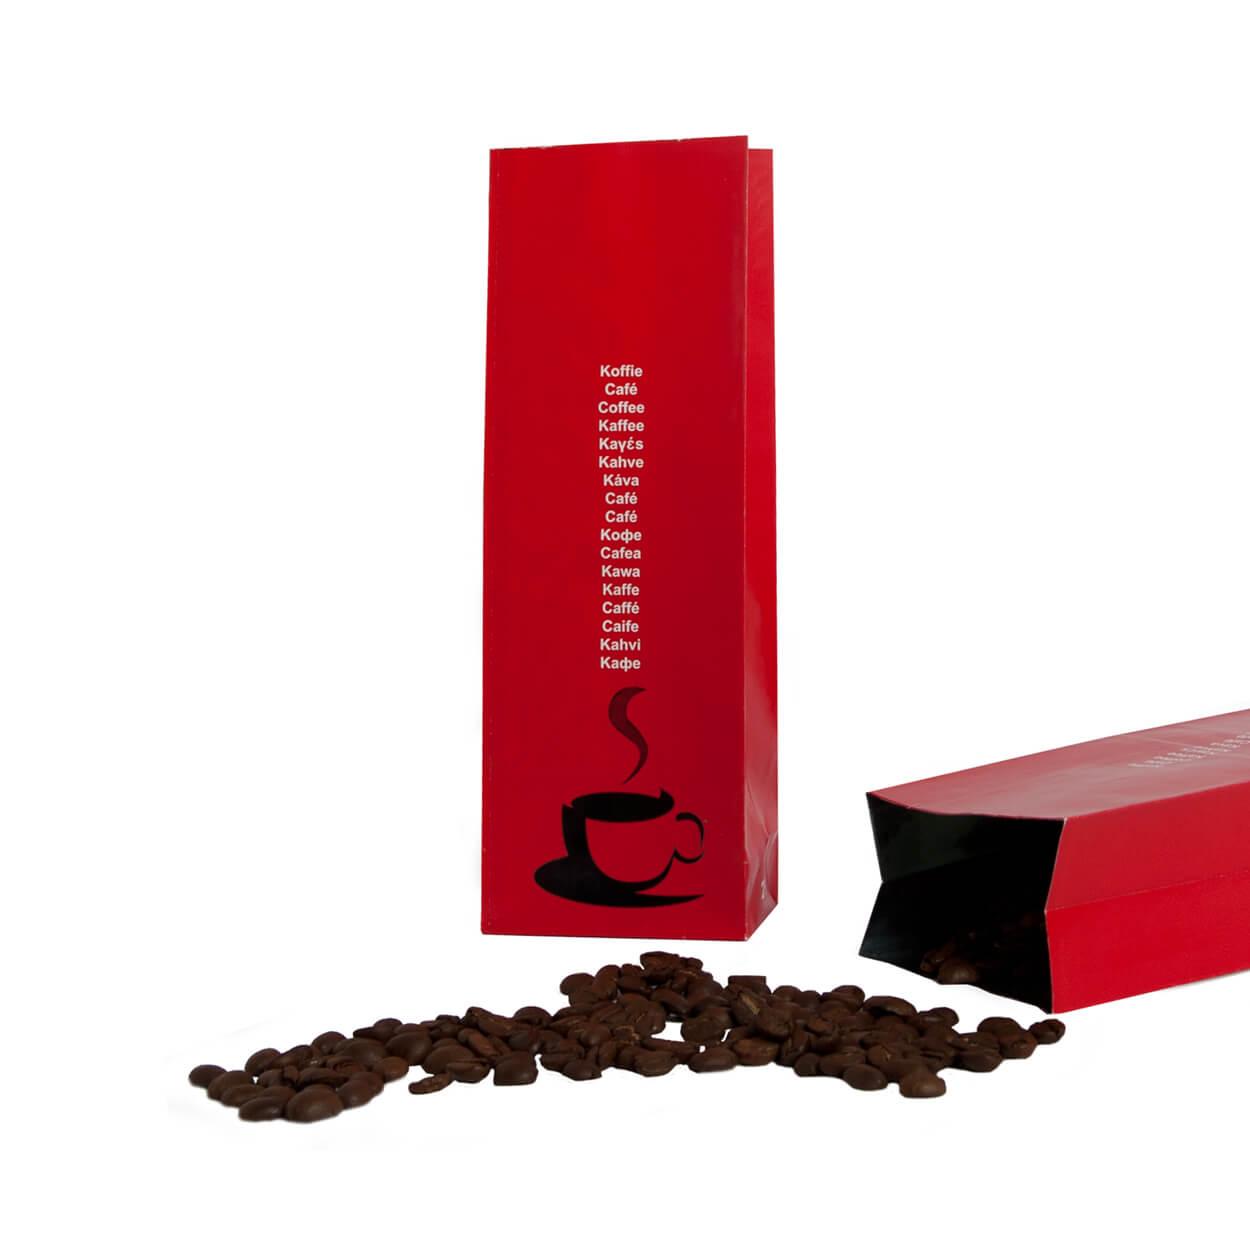 Rode koffiezakjes papieren zakjes baginco for Papieren vensterzakjes